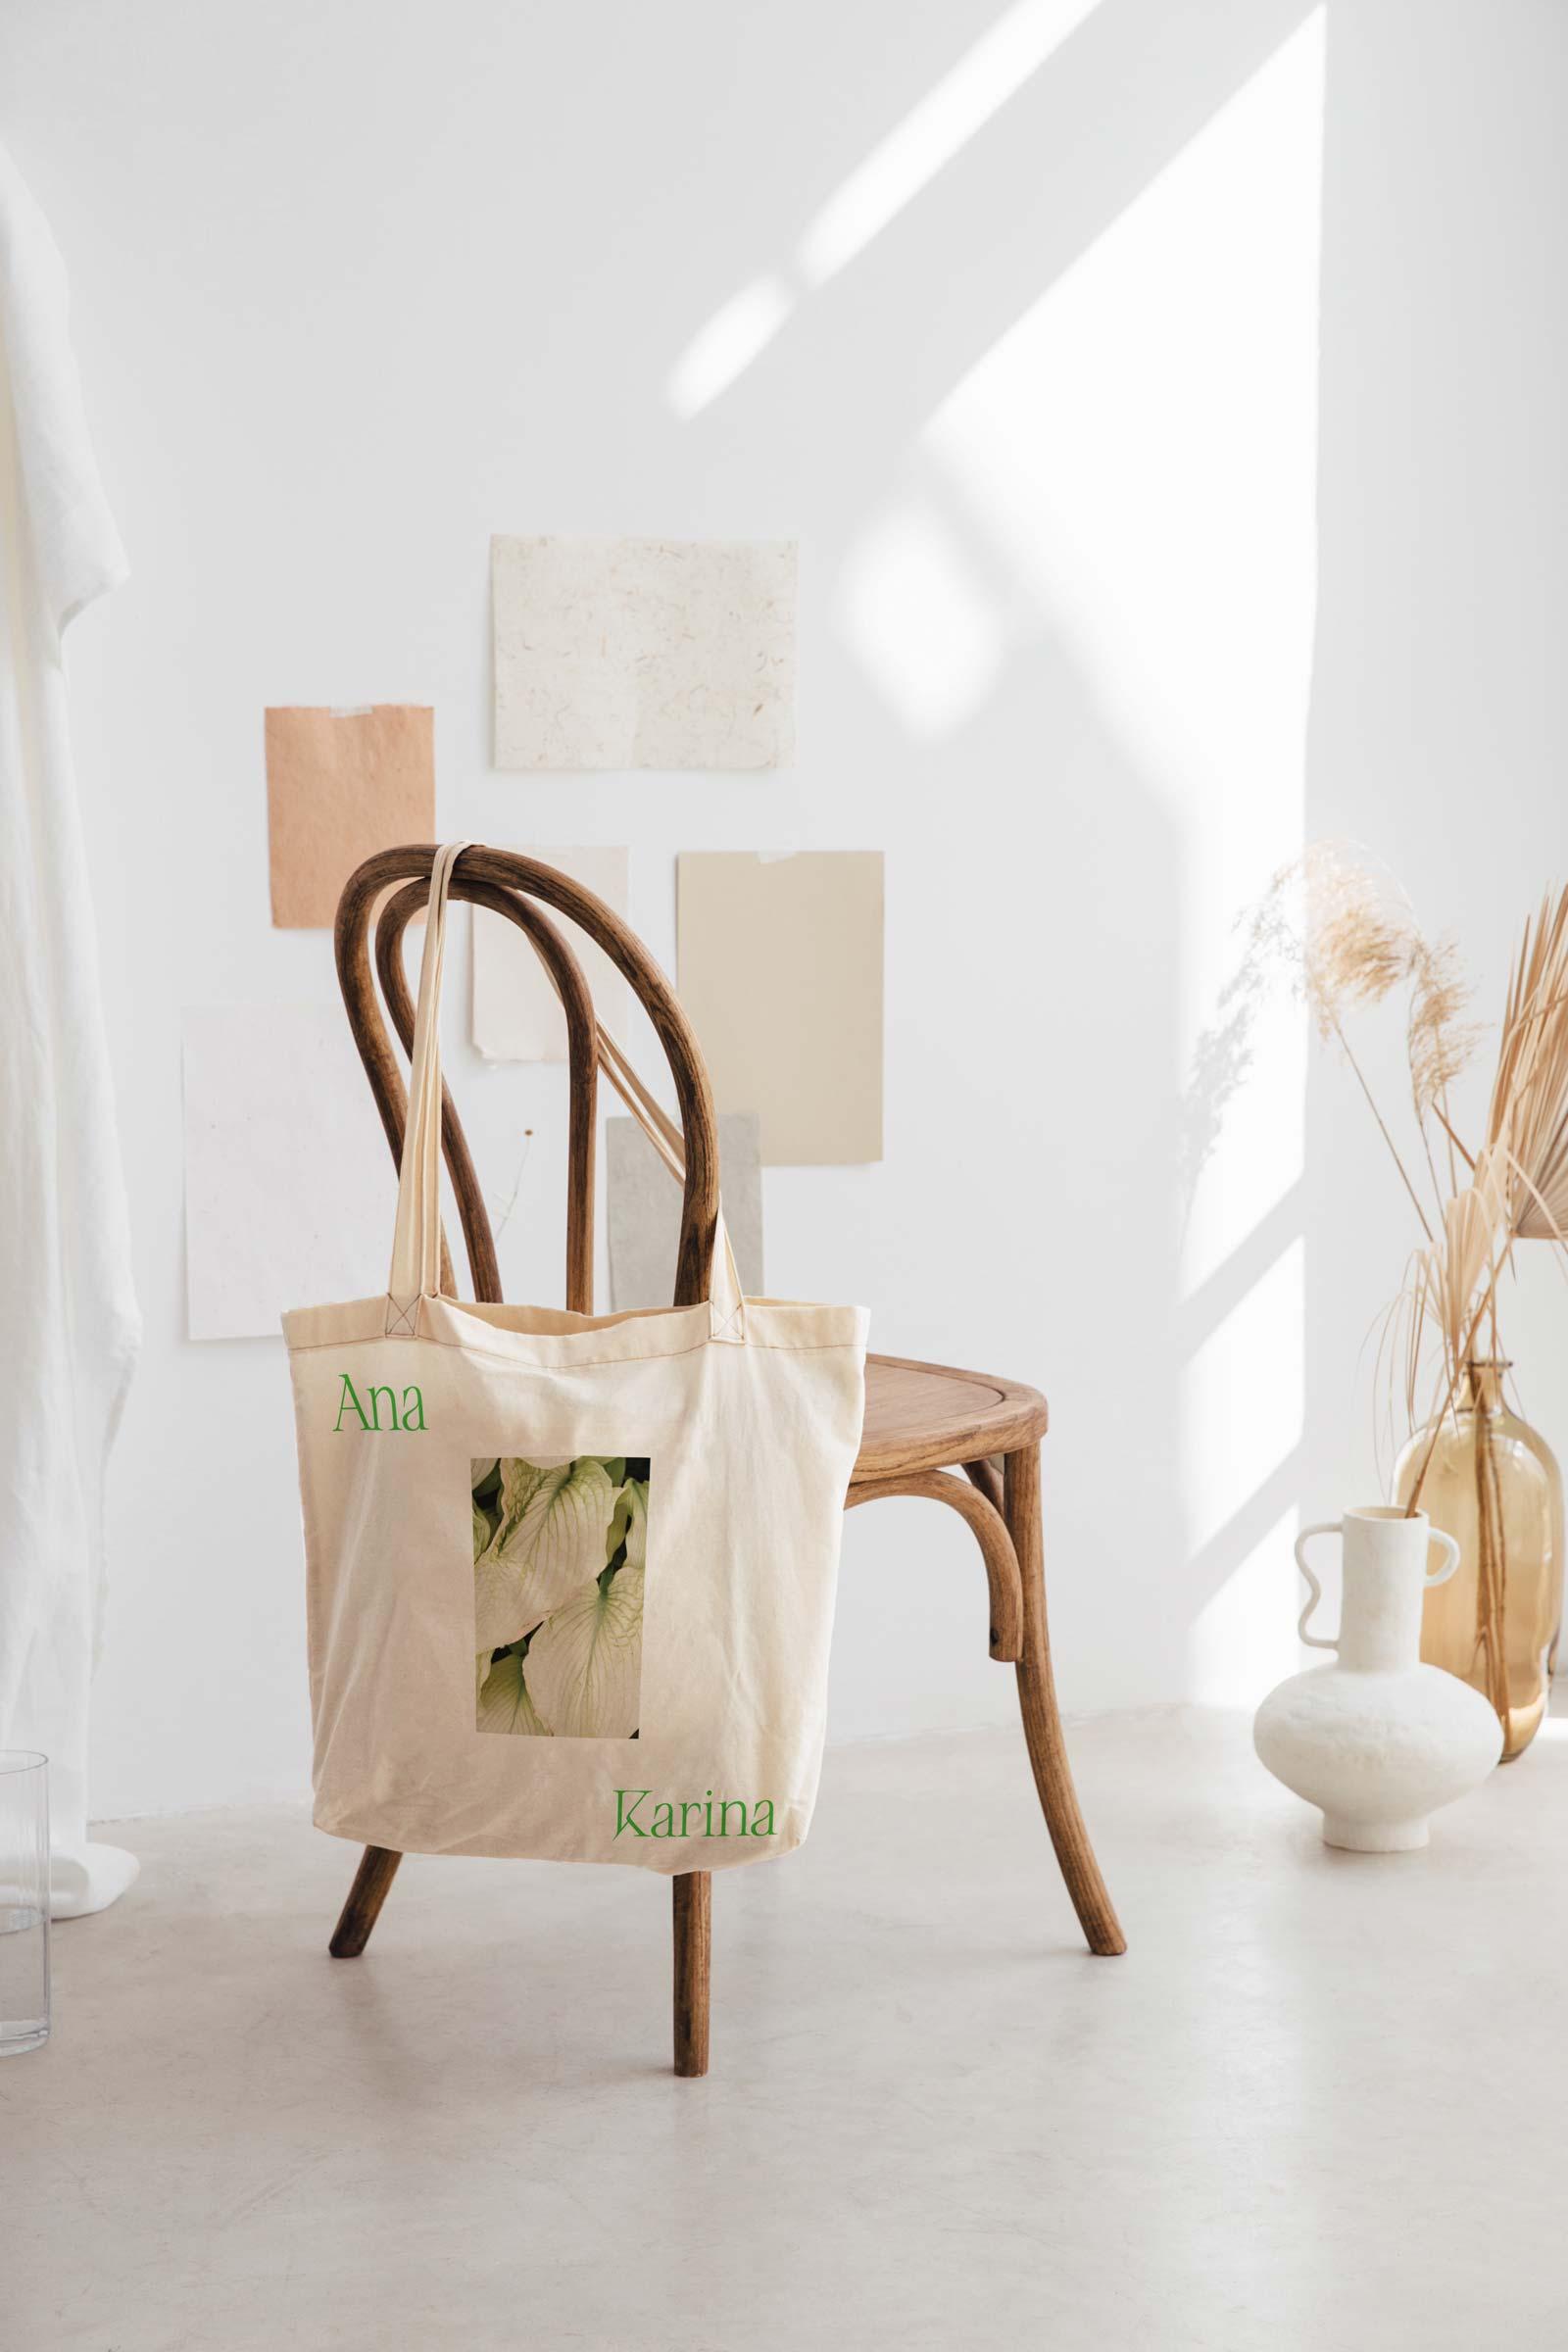 Ana Karina Sustainable Fashion Brand Kit – Fair Tote Bag